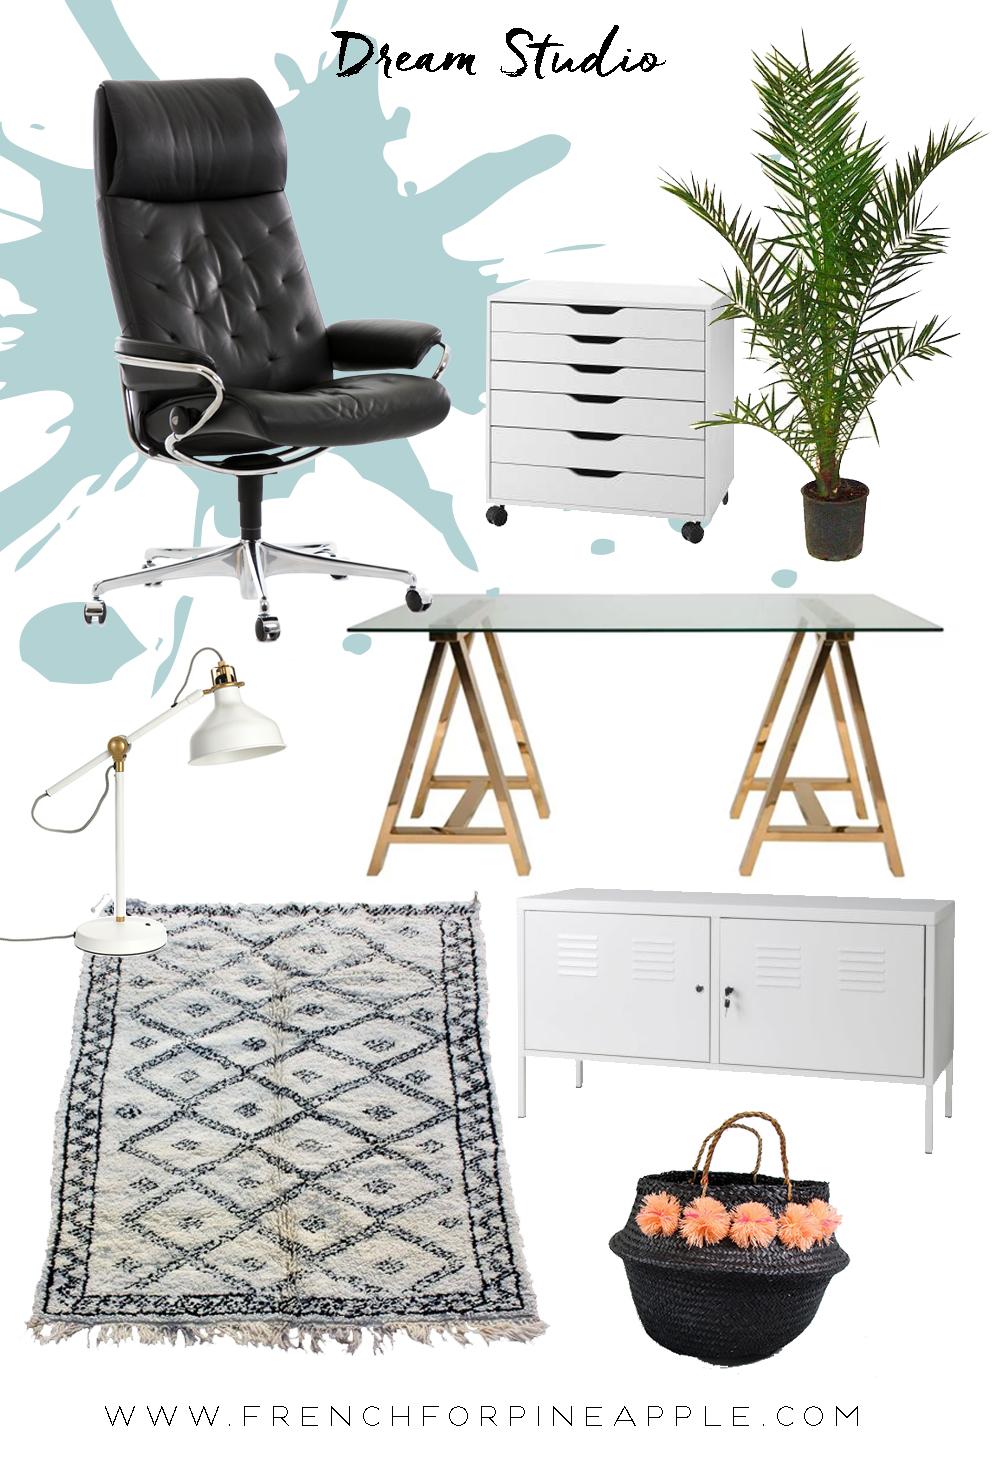 Dream Studio Moodboard - French For Pineapple Blog